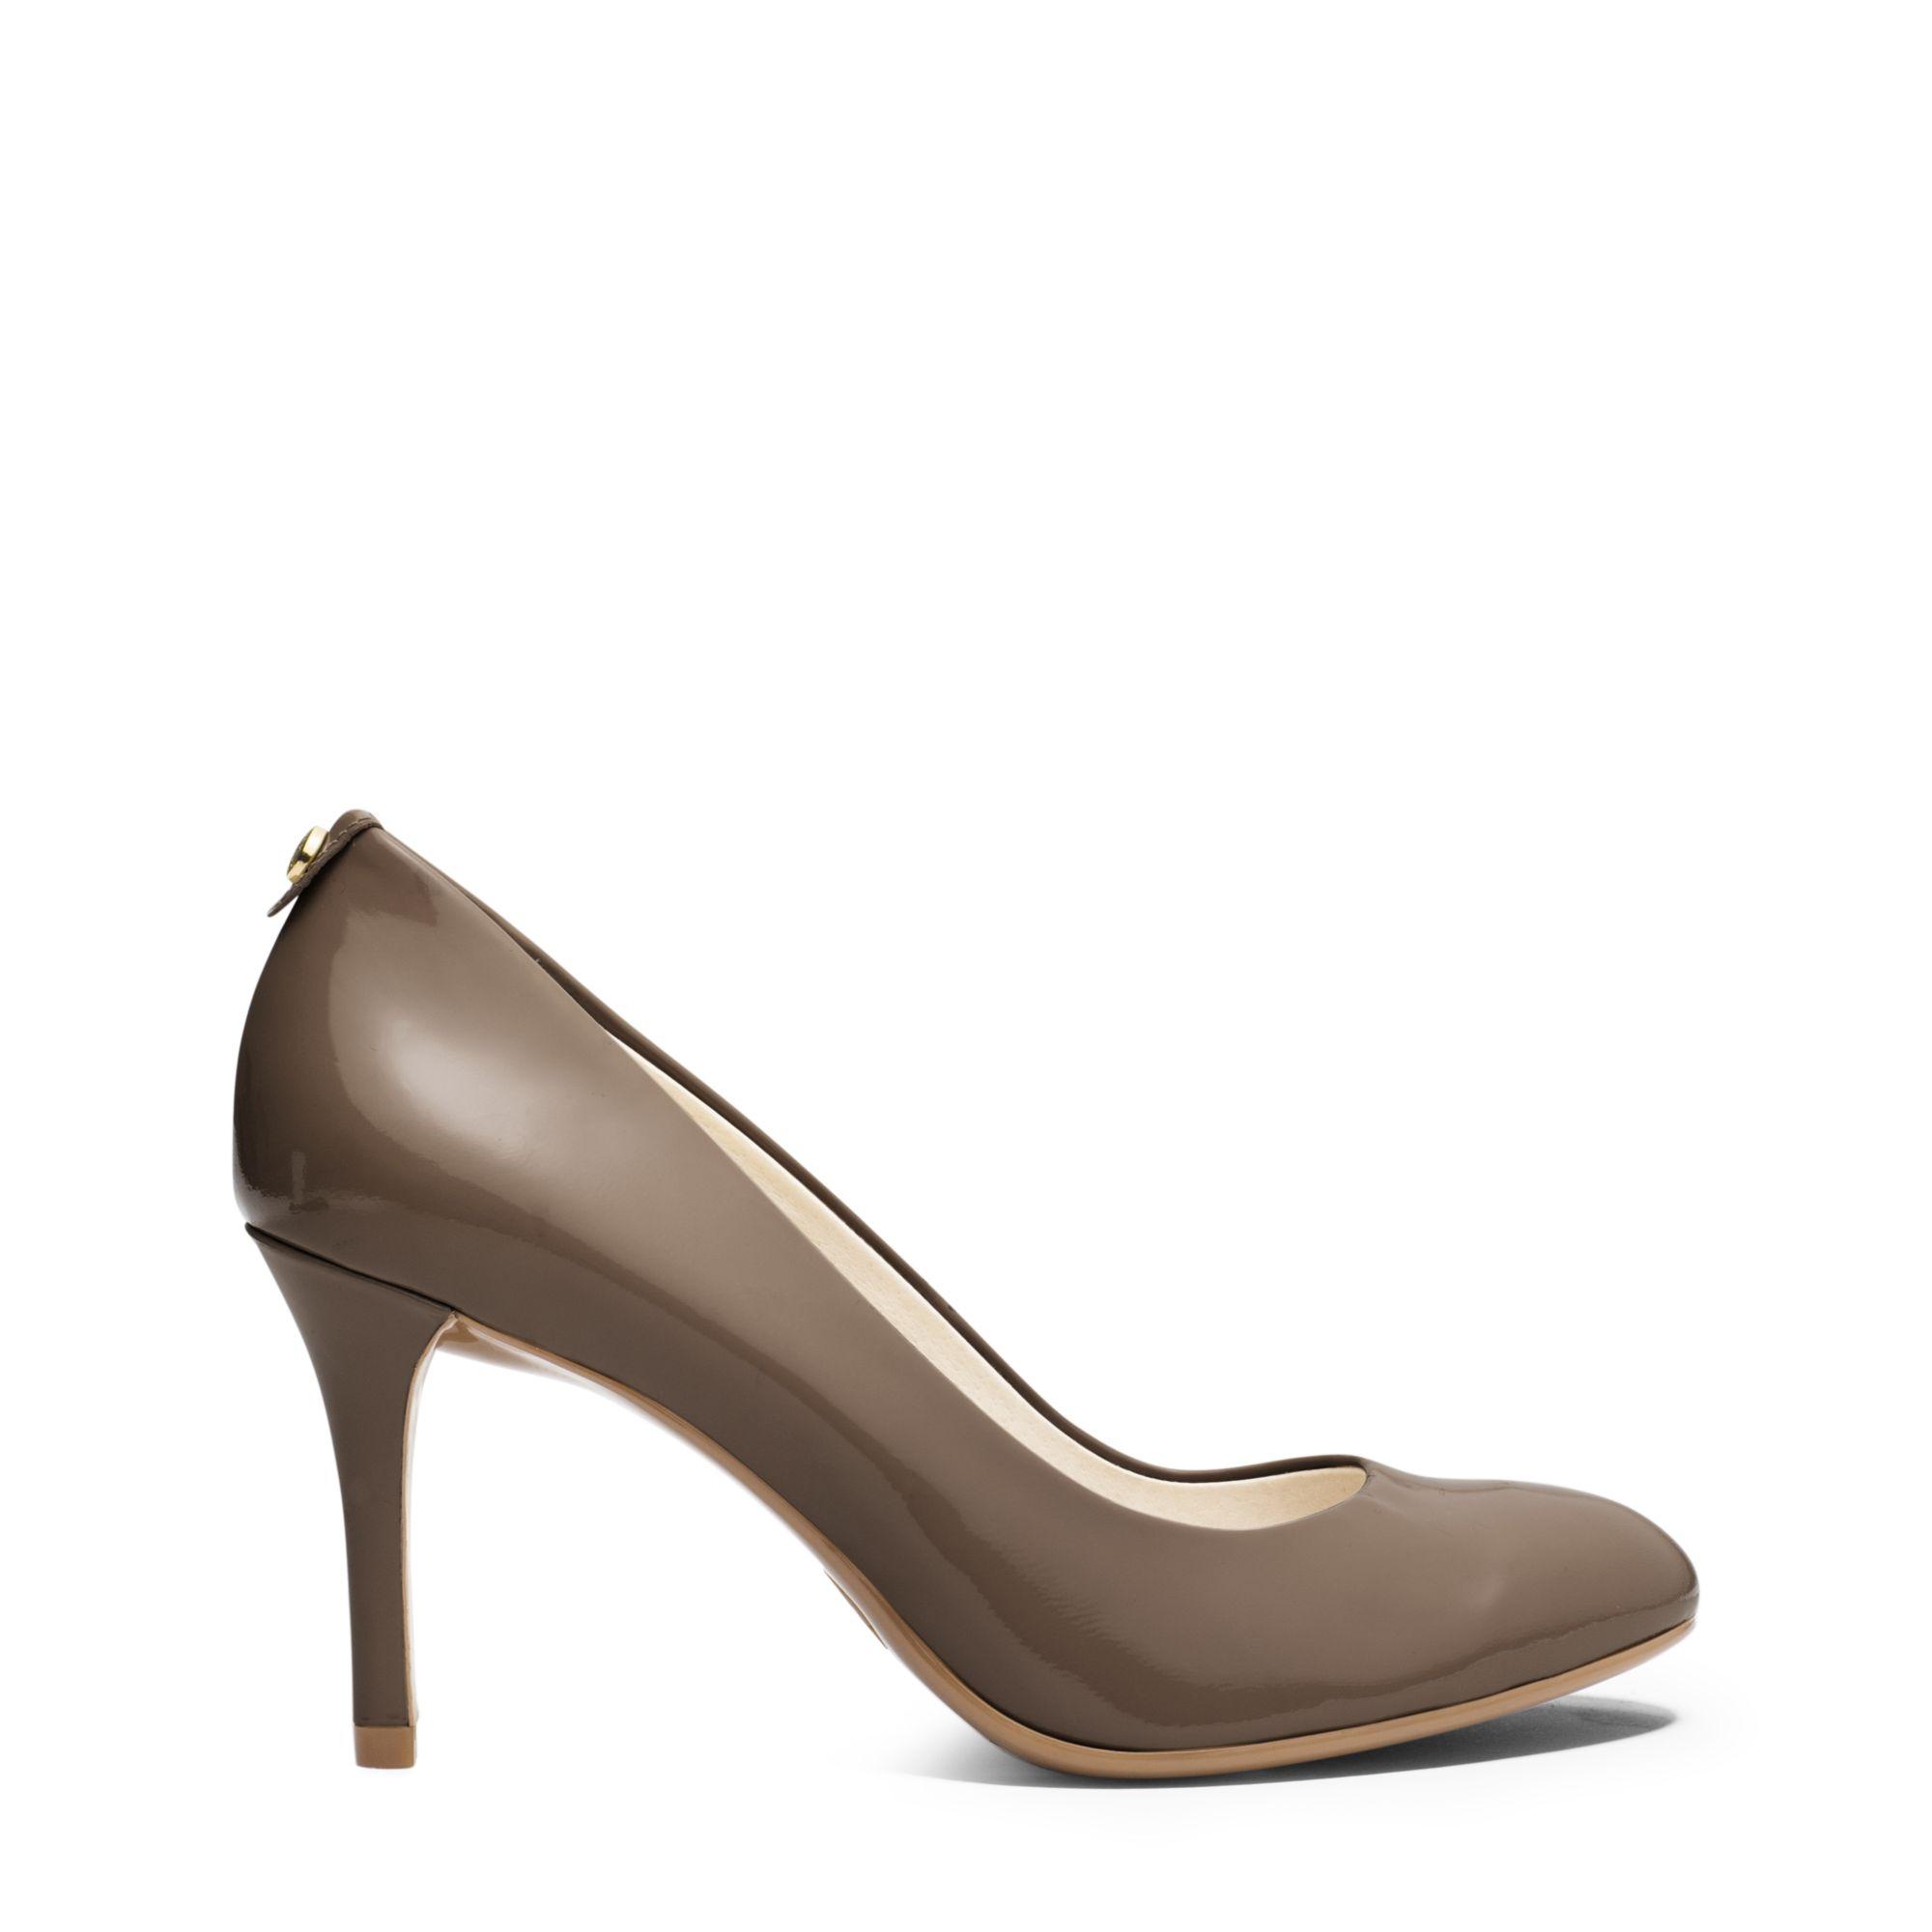 lyst michael kors flex patent leather mid heel pump in brown. Black Bedroom Furniture Sets. Home Design Ideas